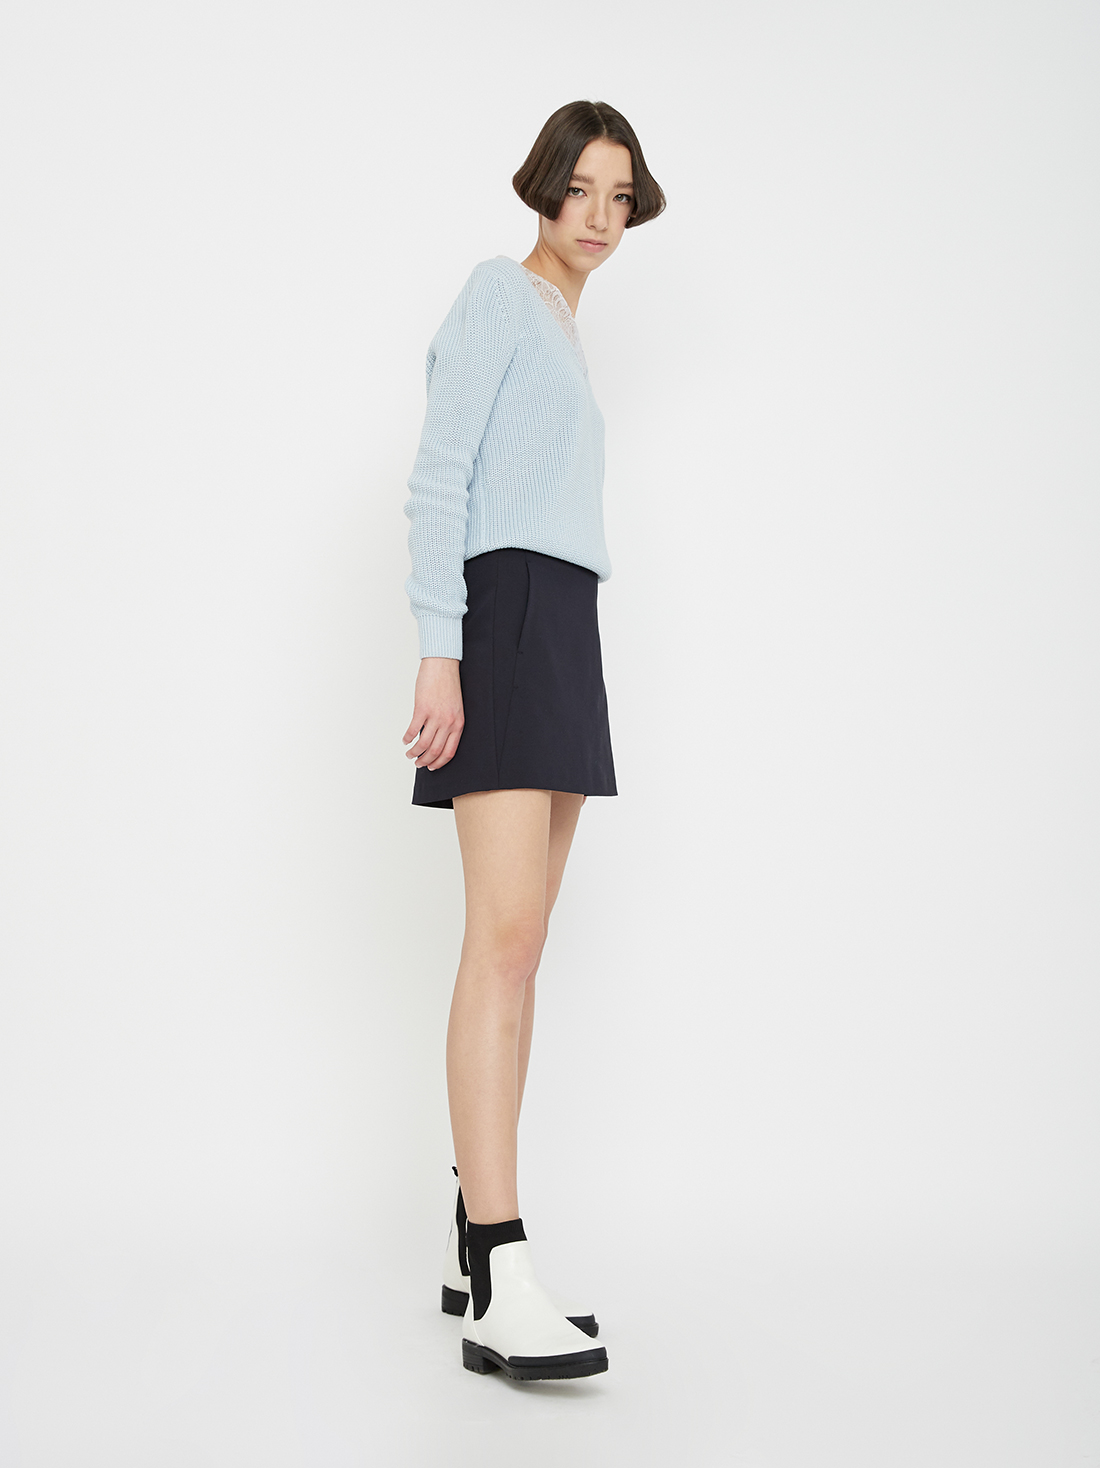 Юбка LIME Юбка-шорты юбка короткая из денима с геометрическим рисунком